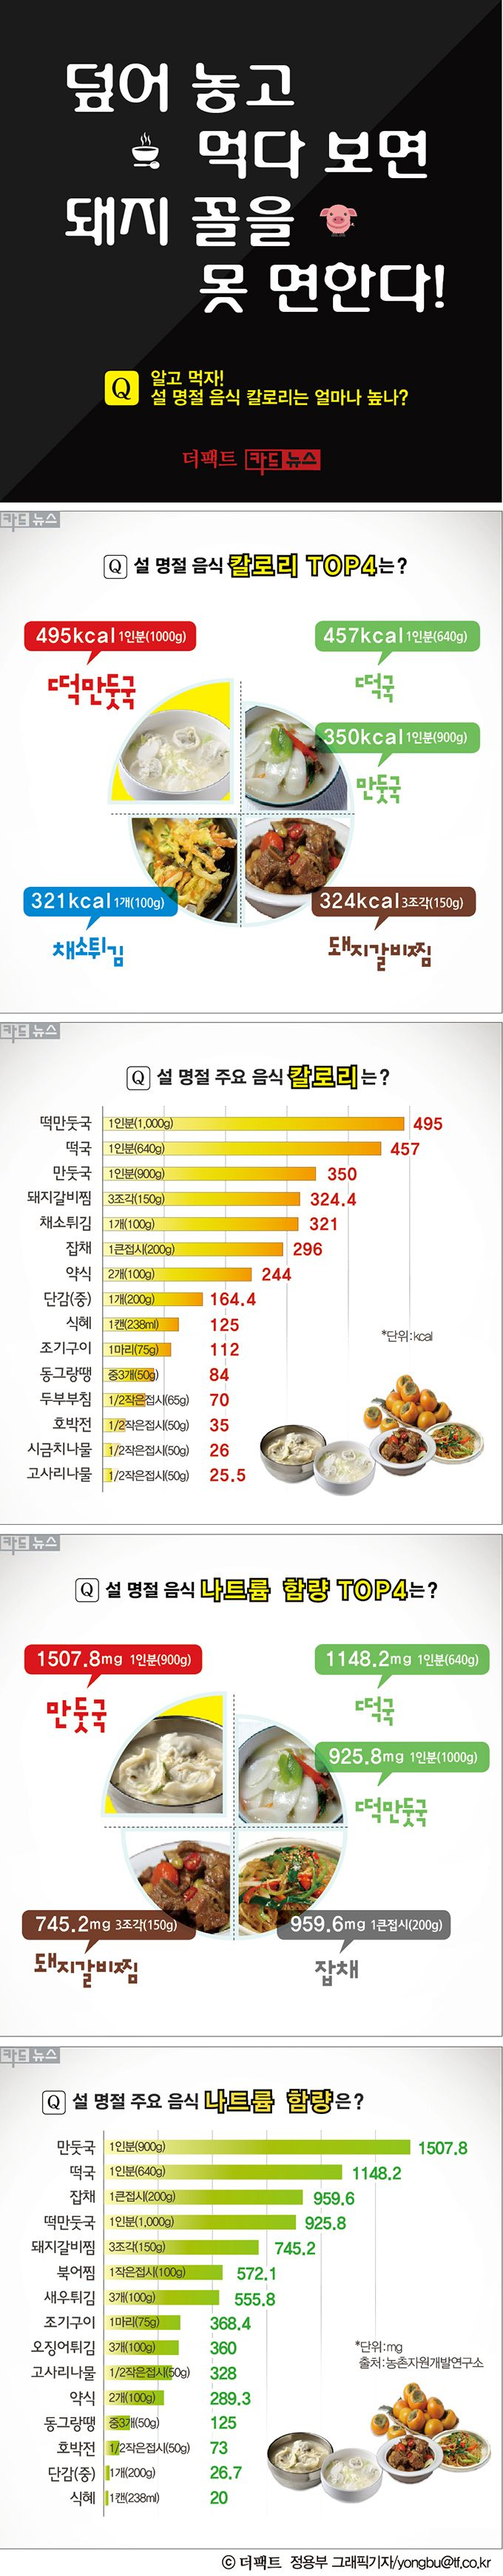 [TF카드뉴스] '설 명절 음식' 알고 먹자! '칼로리 TOP 4'